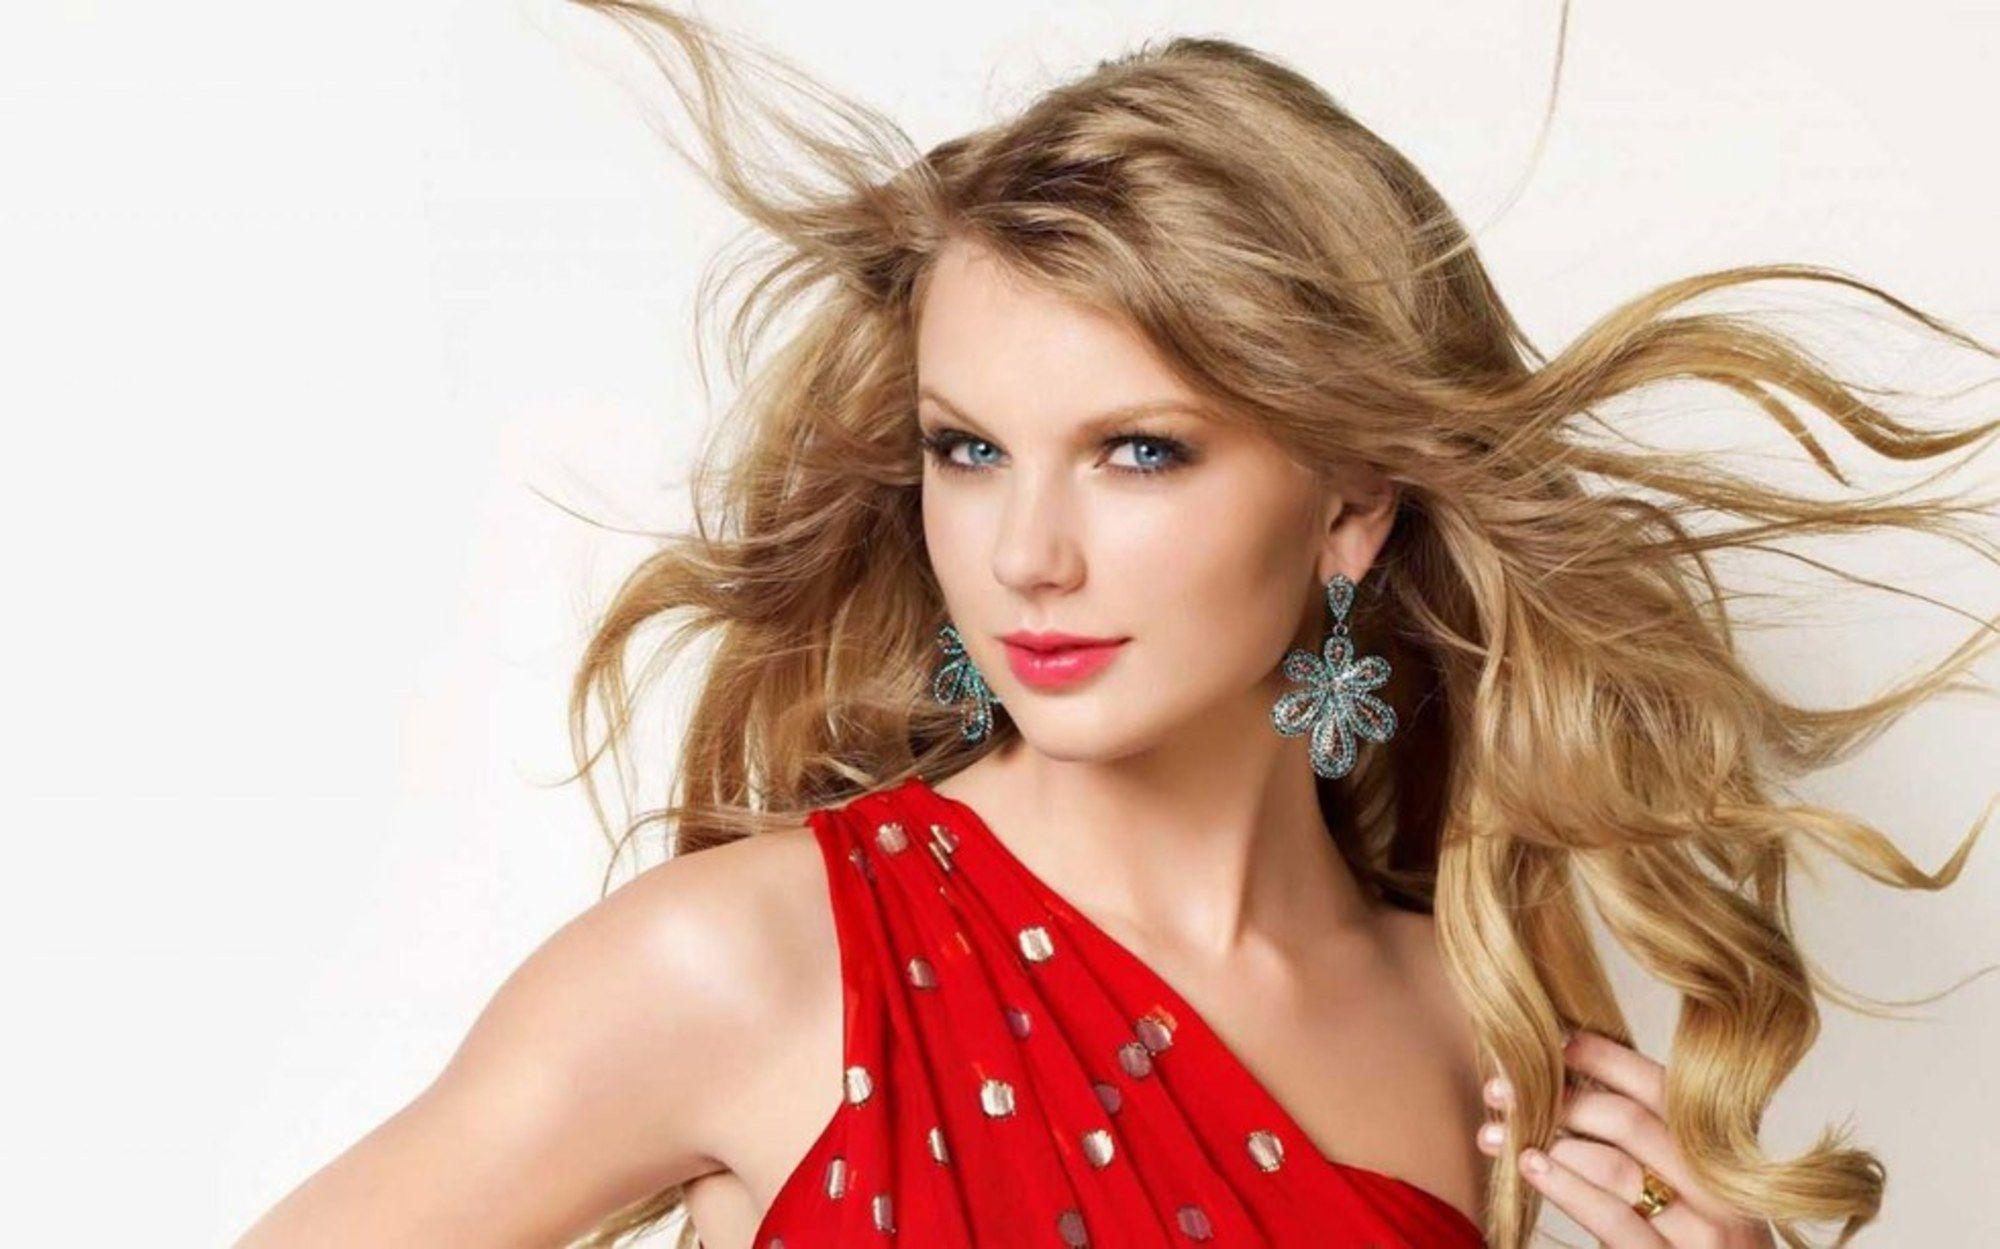 45 Of The Greatest Taylor Swift Lyrics